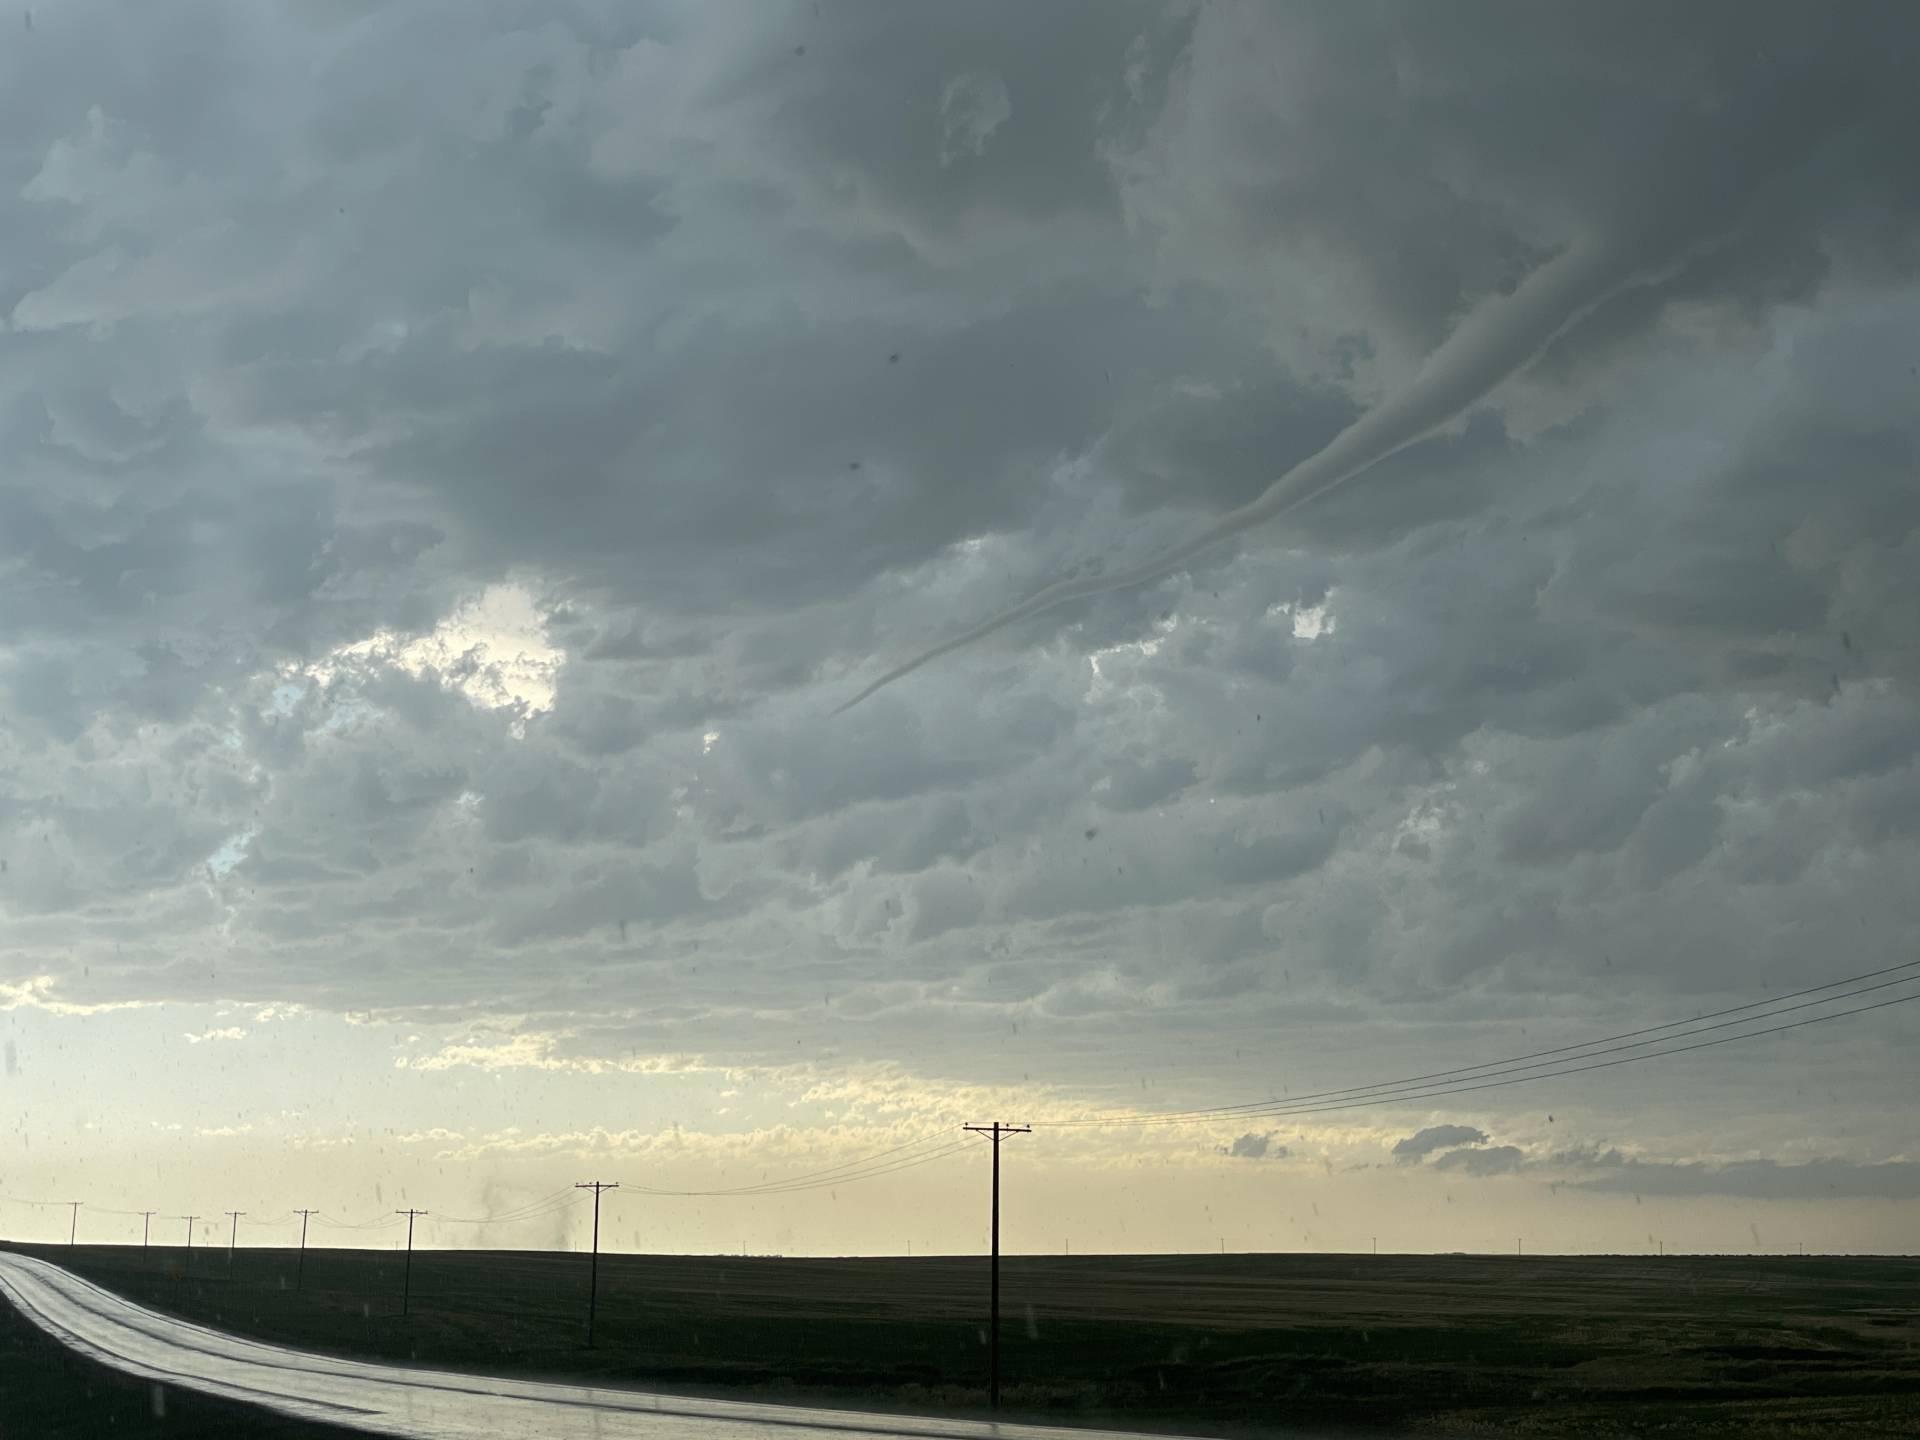 Tornado McGee SK 6:30 pm